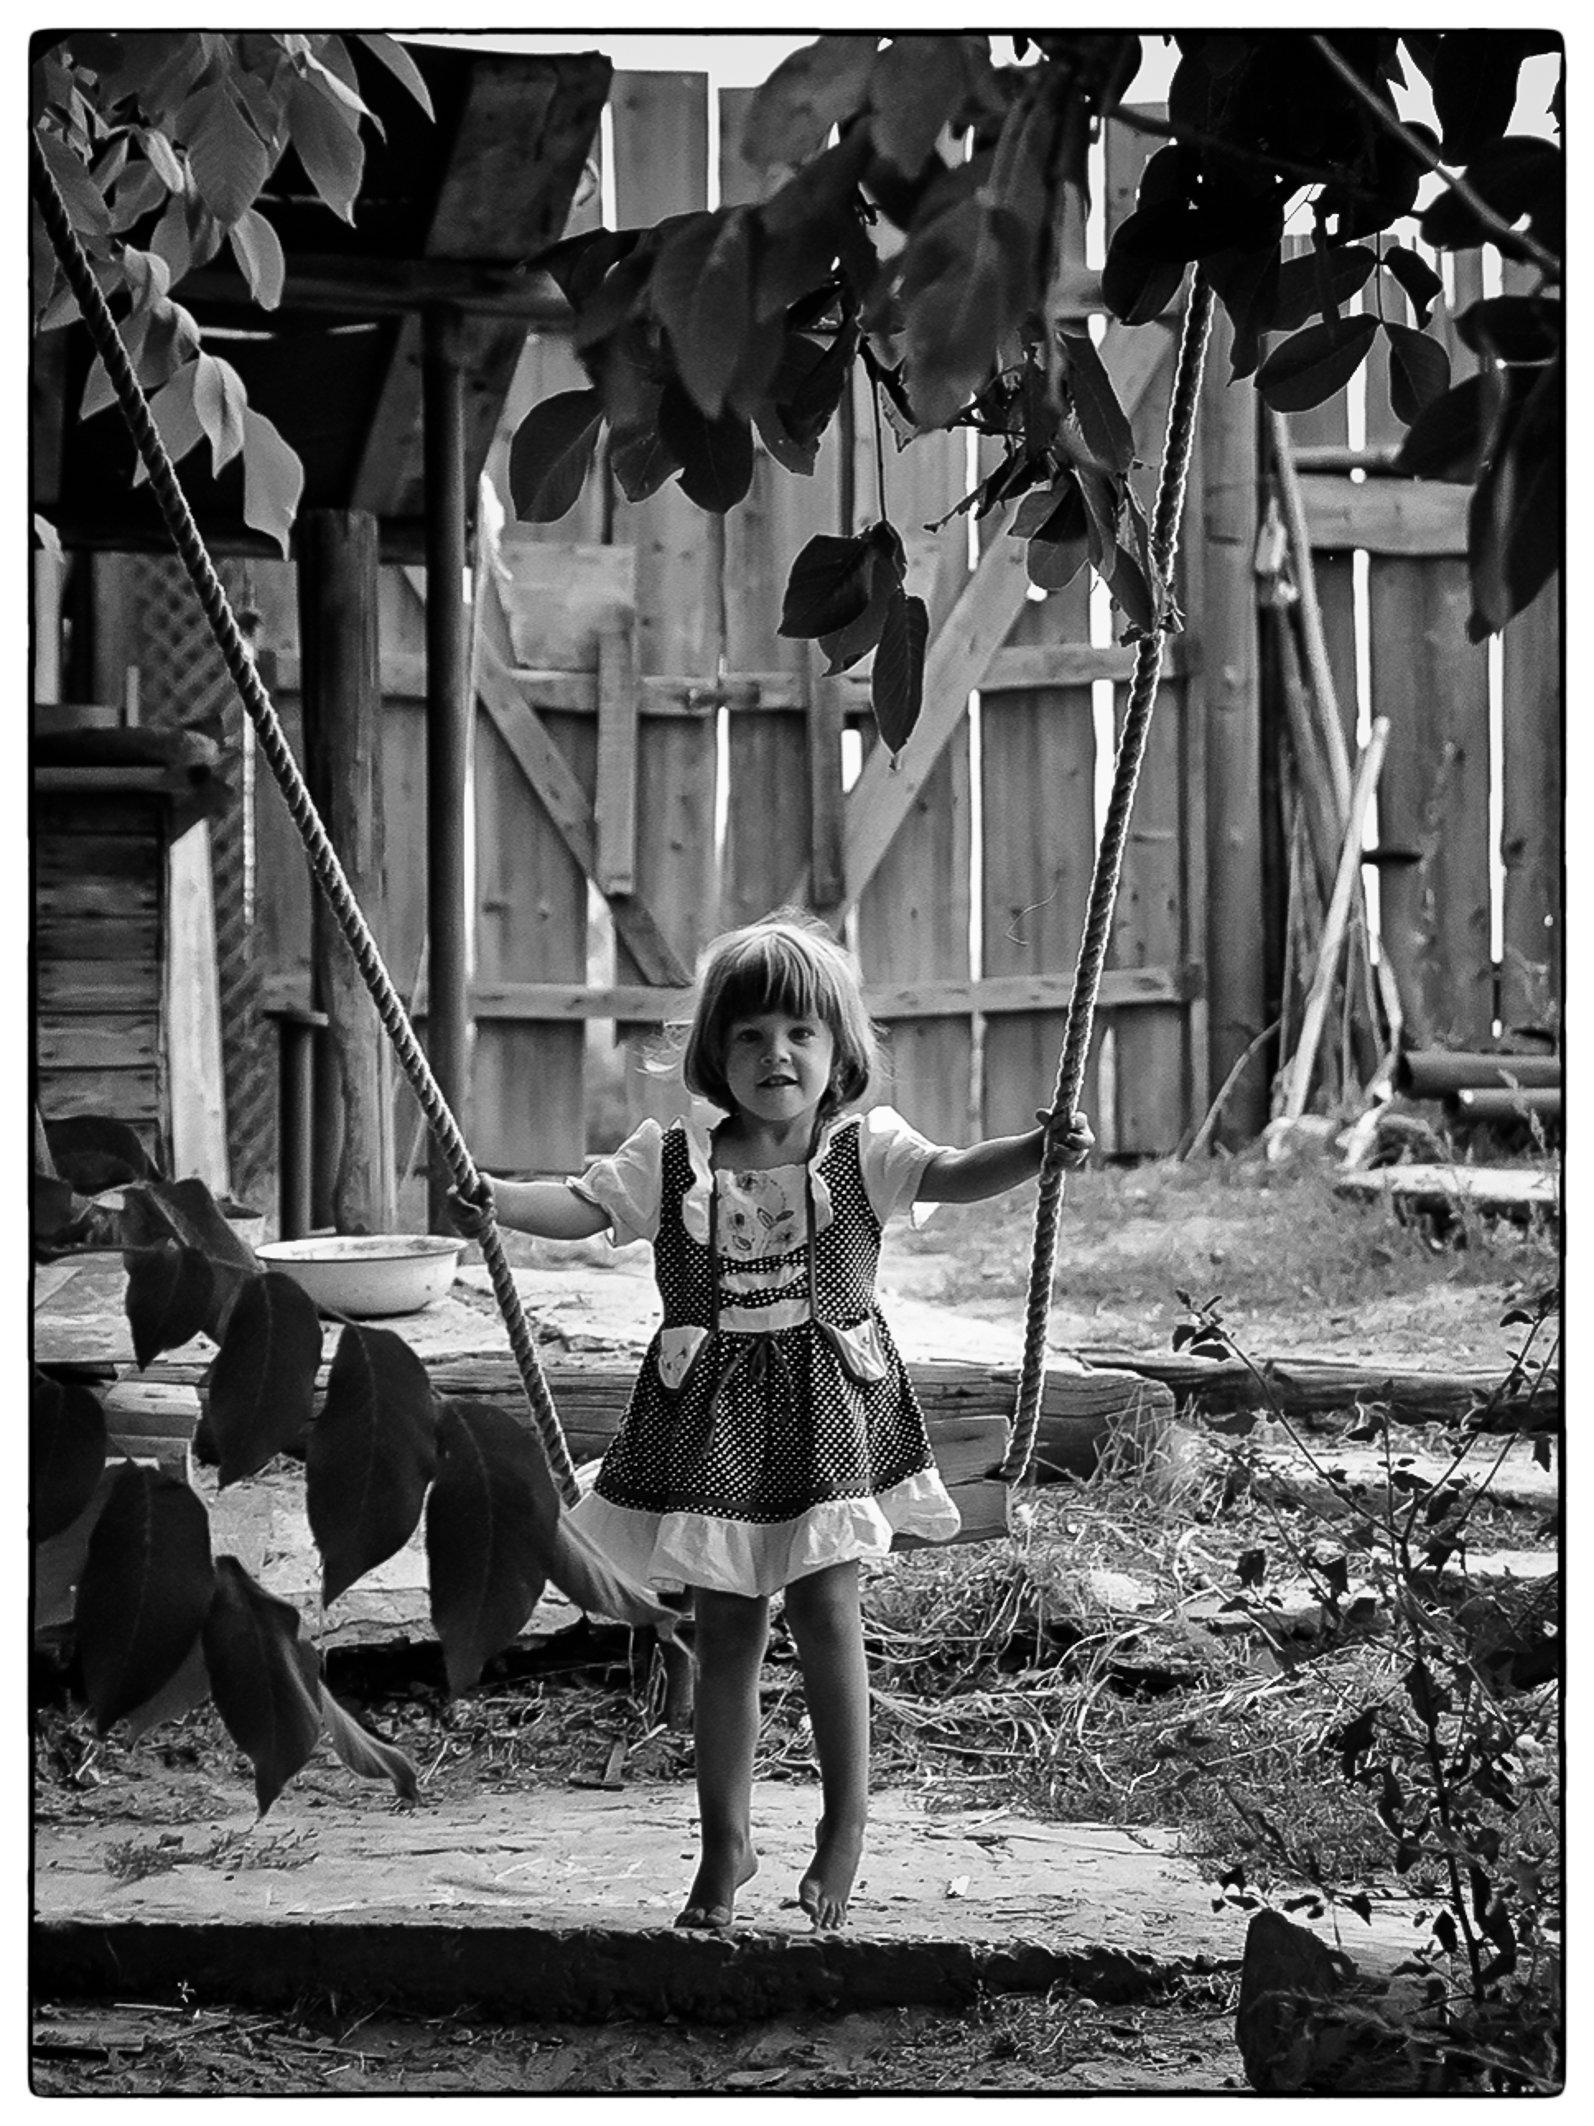 Astrakhan Russia People Summer Photo Children, Андреа Сивилотти